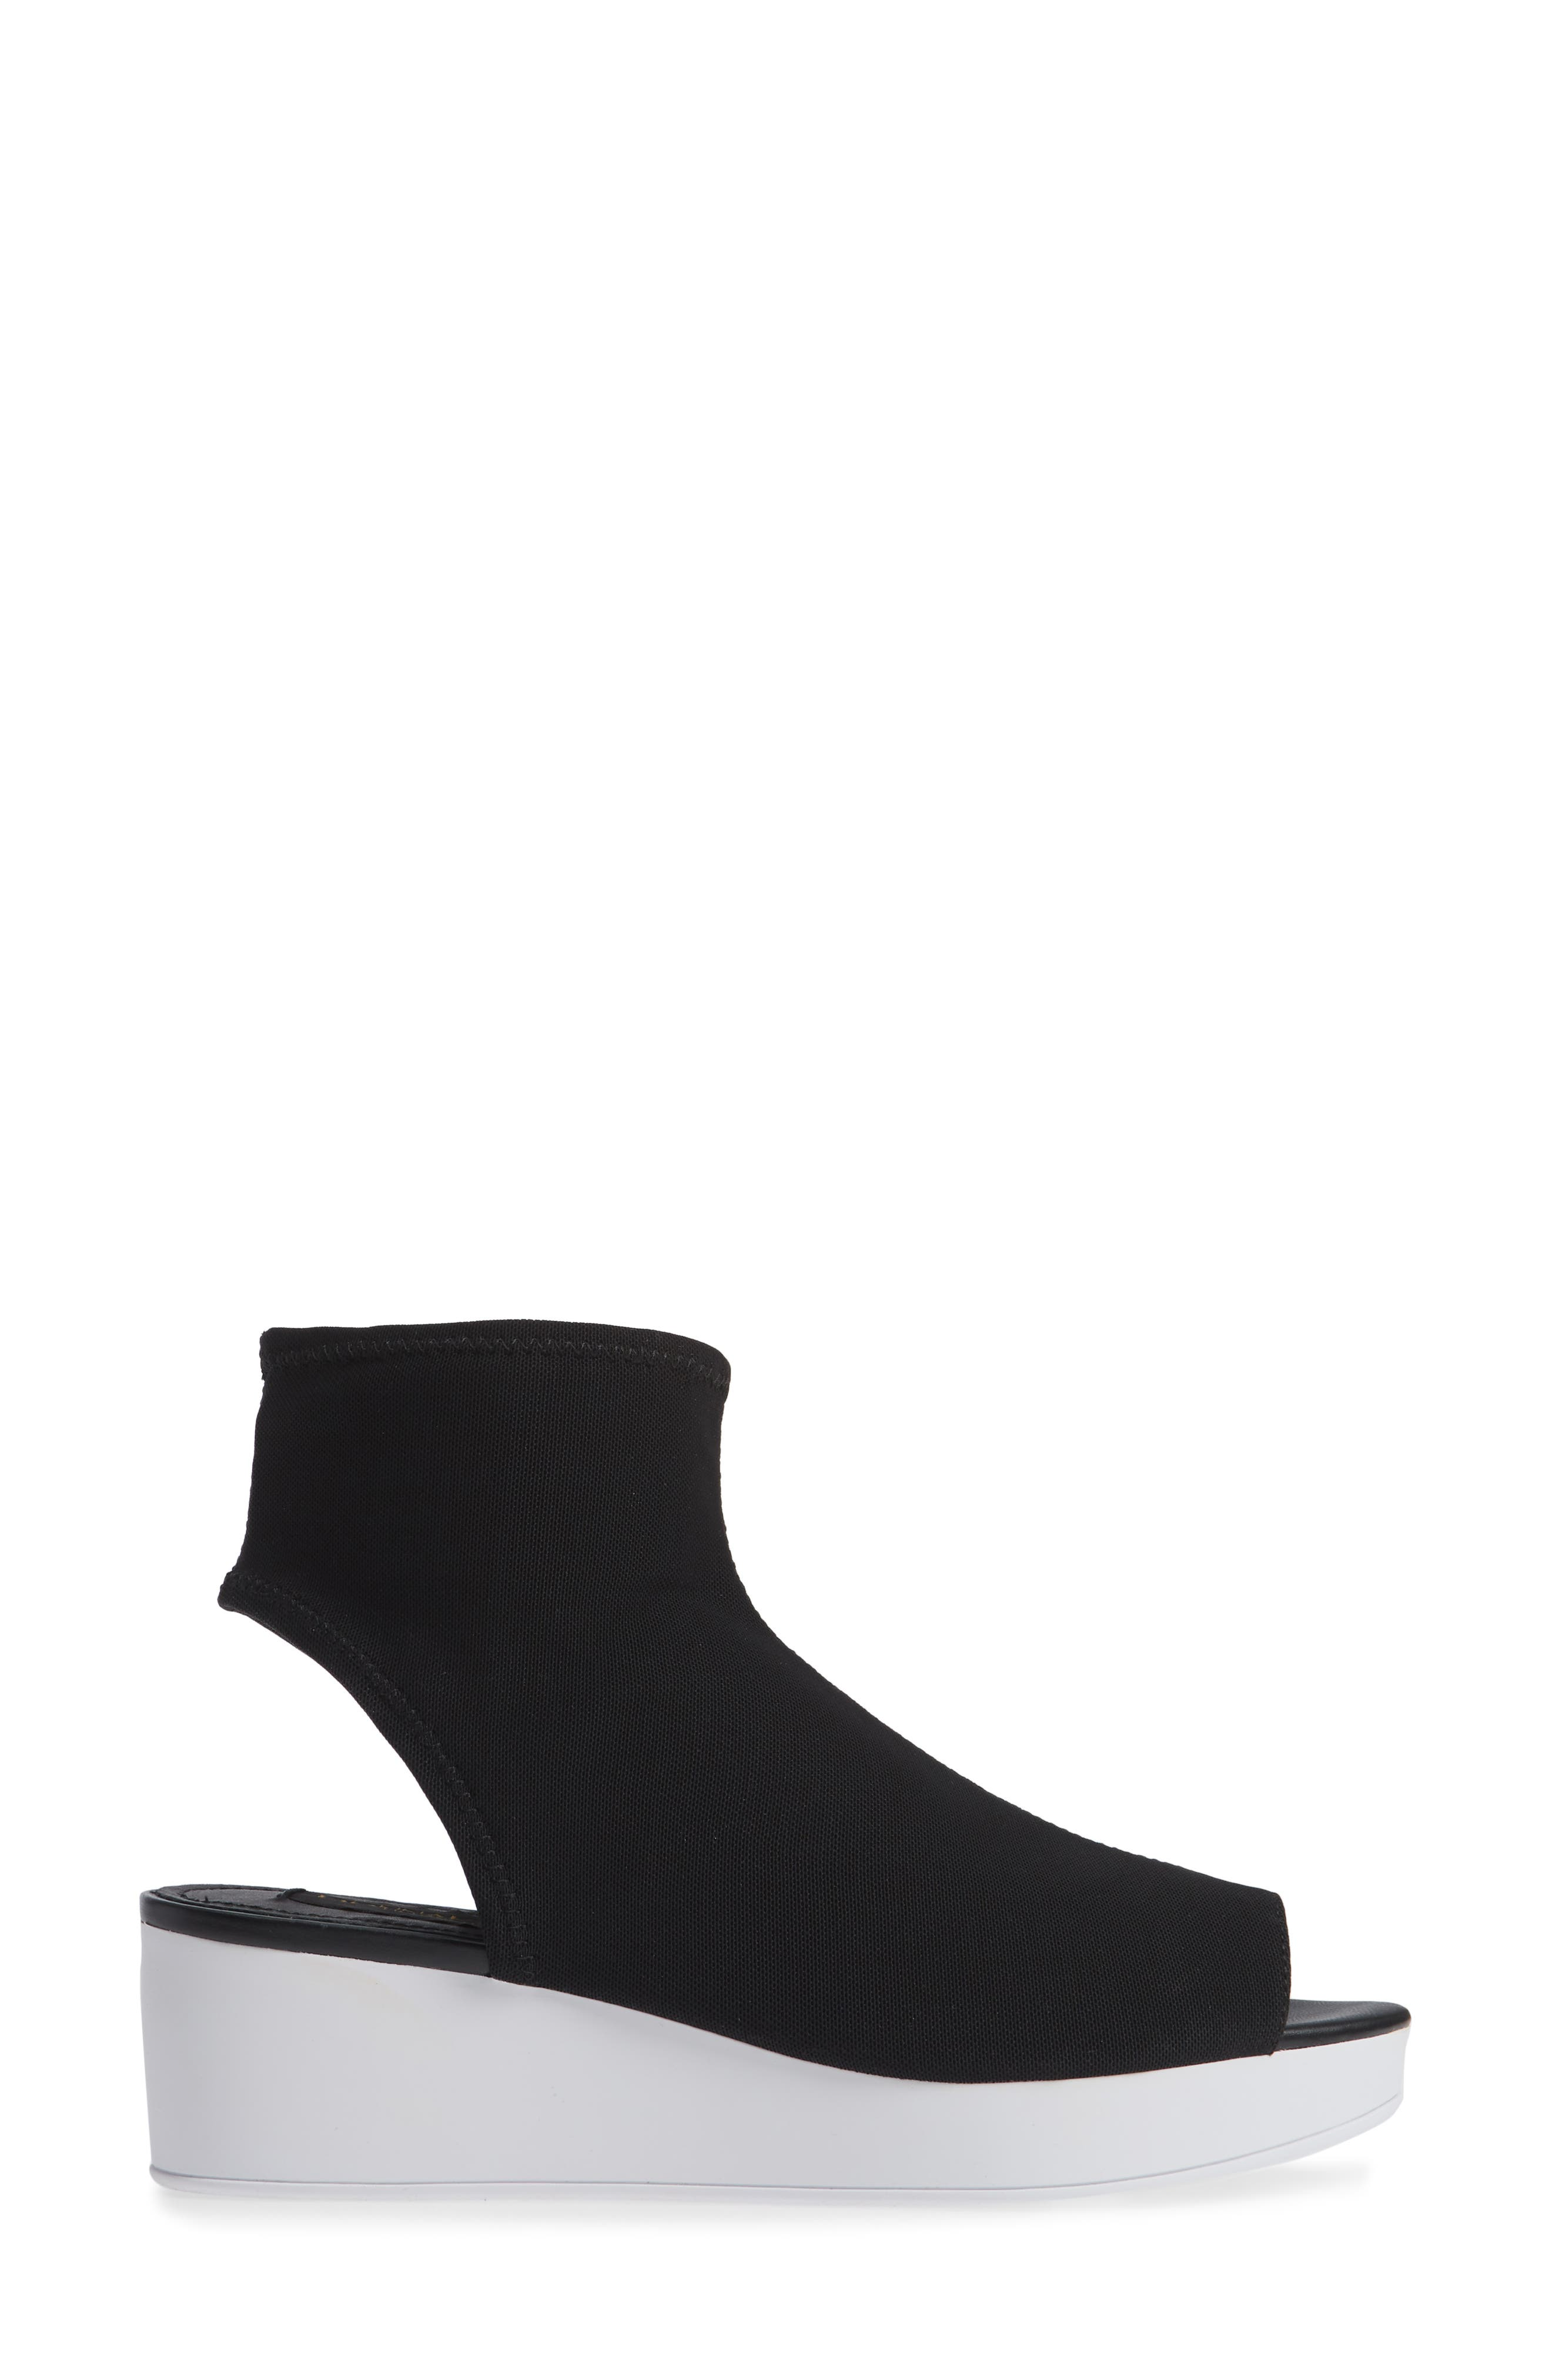 Donna Karan Rivera Mid-Wedge Sandal,                             Alternate thumbnail 3, color,                             BLACK STRETCH FLY KNIT